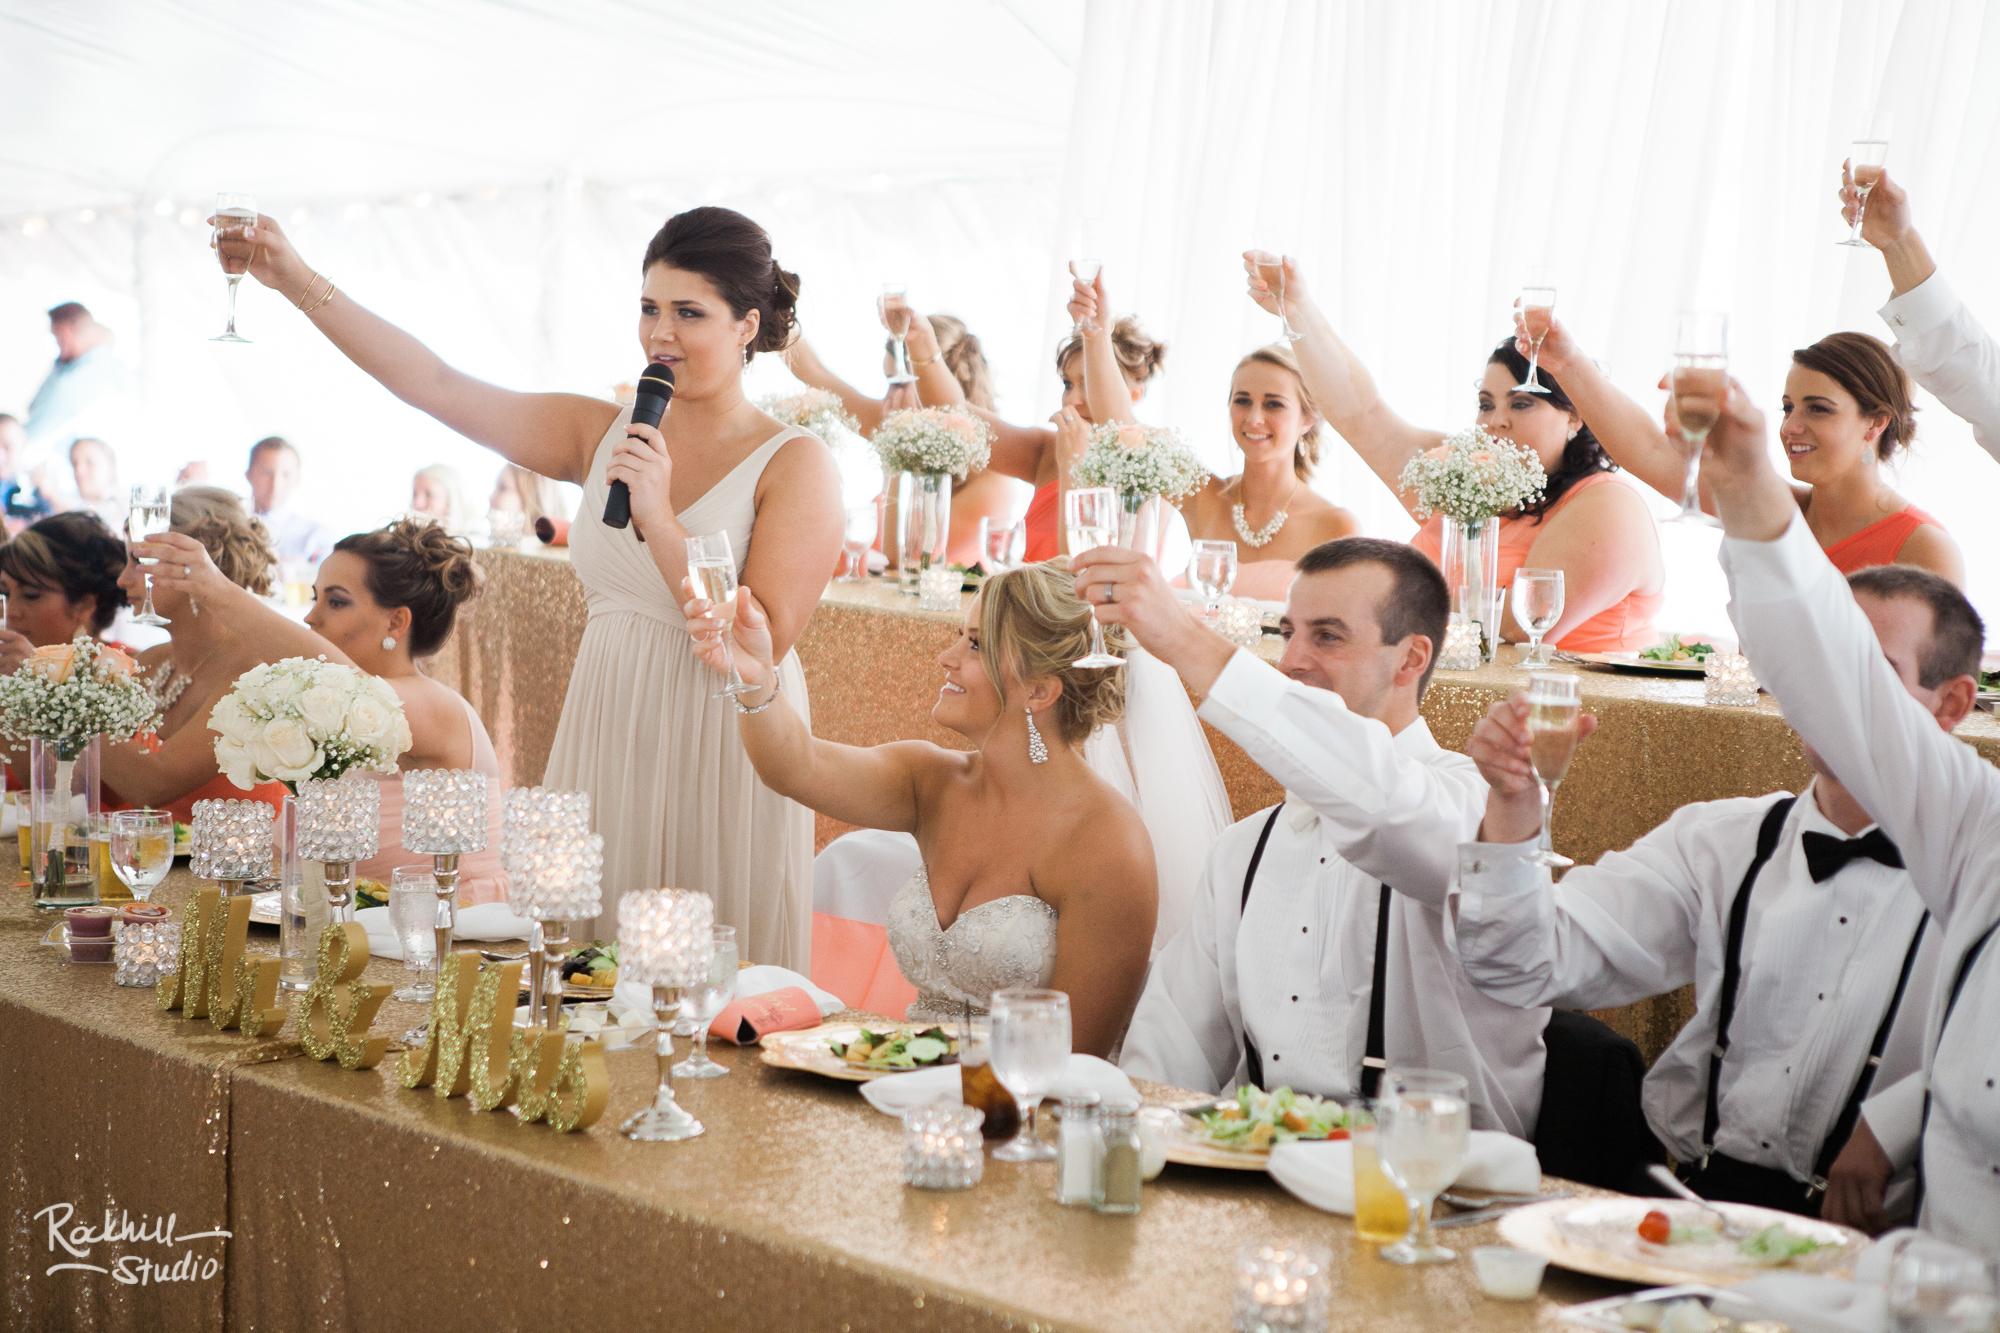 marquette-wedding-photograher-upper-peninsula-landmark-inn-michigan-bridesmaid-toast.jpg